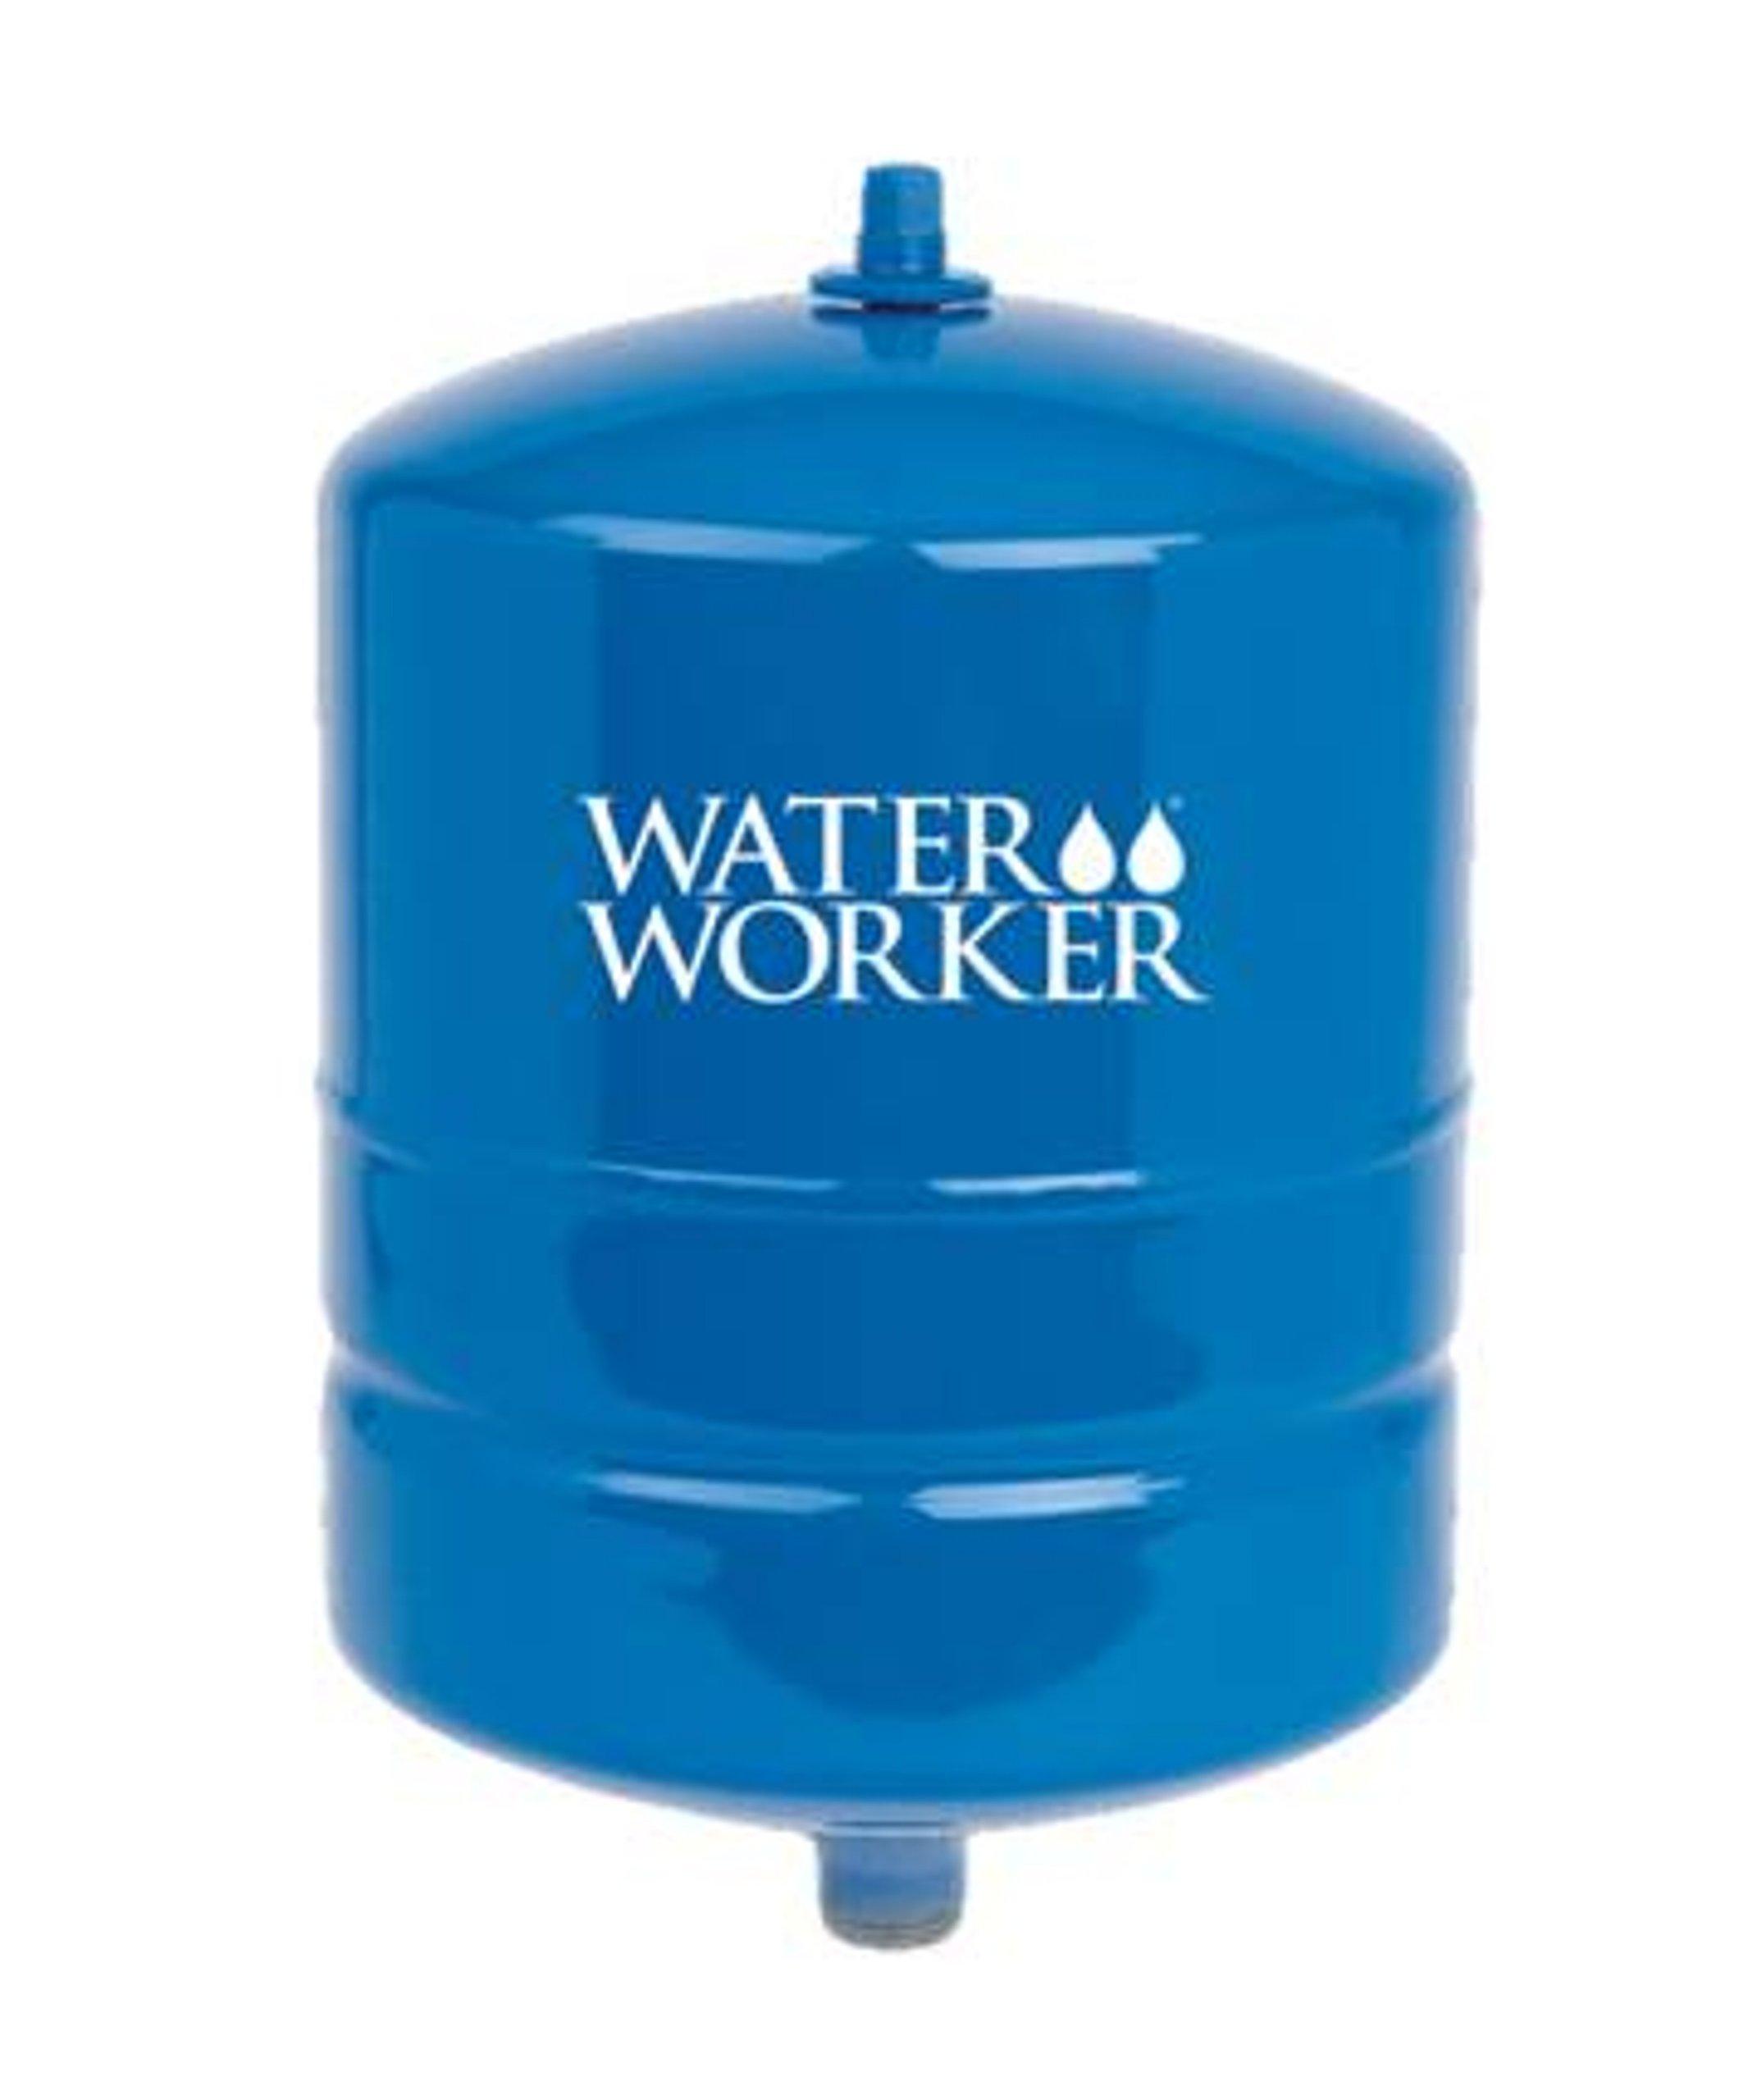 WaterWorker HT-2B Water Worker Vertical Pre-Charged Well Tank, 20 Gal, 3/4 In Mnpt, 100 Psi, Steel, 2-Gallon by Water Worker